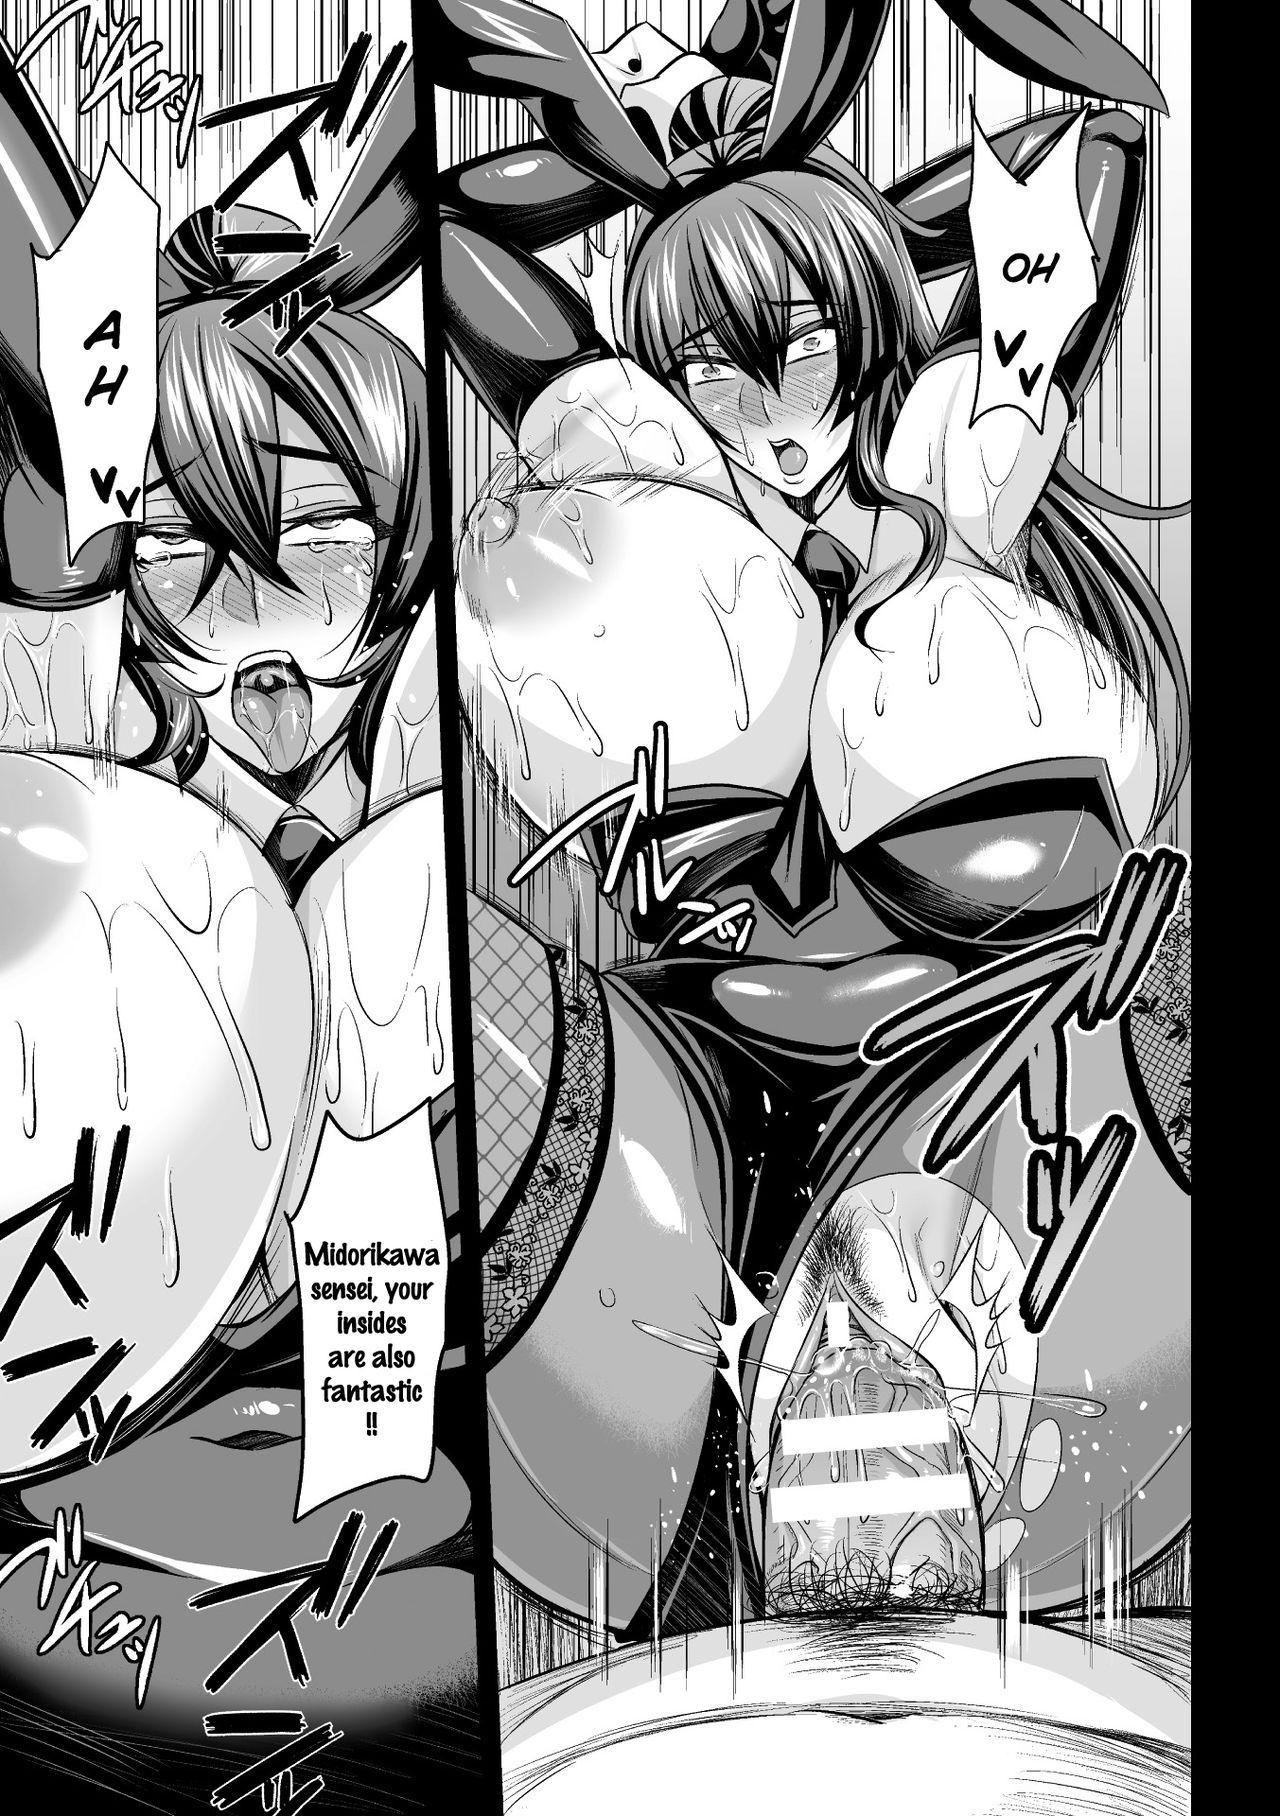 2D Comic Magazine Waki Fechi Bunny Girl Vol.1 Ch 1-3 43